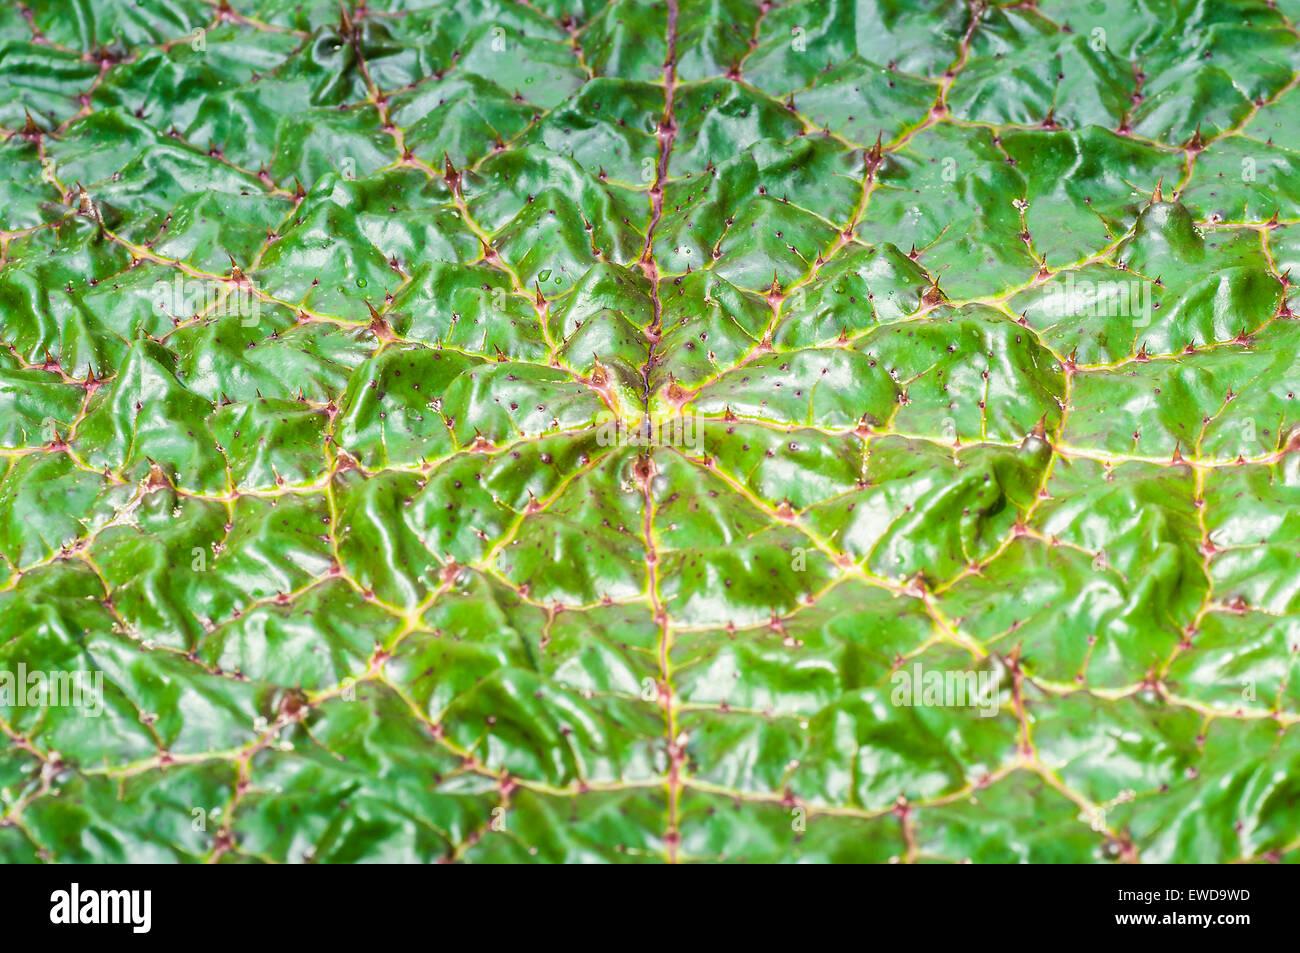 Nelumbo nucifera, lotus leaf. Taken on June 9, 2015 - Stock Image